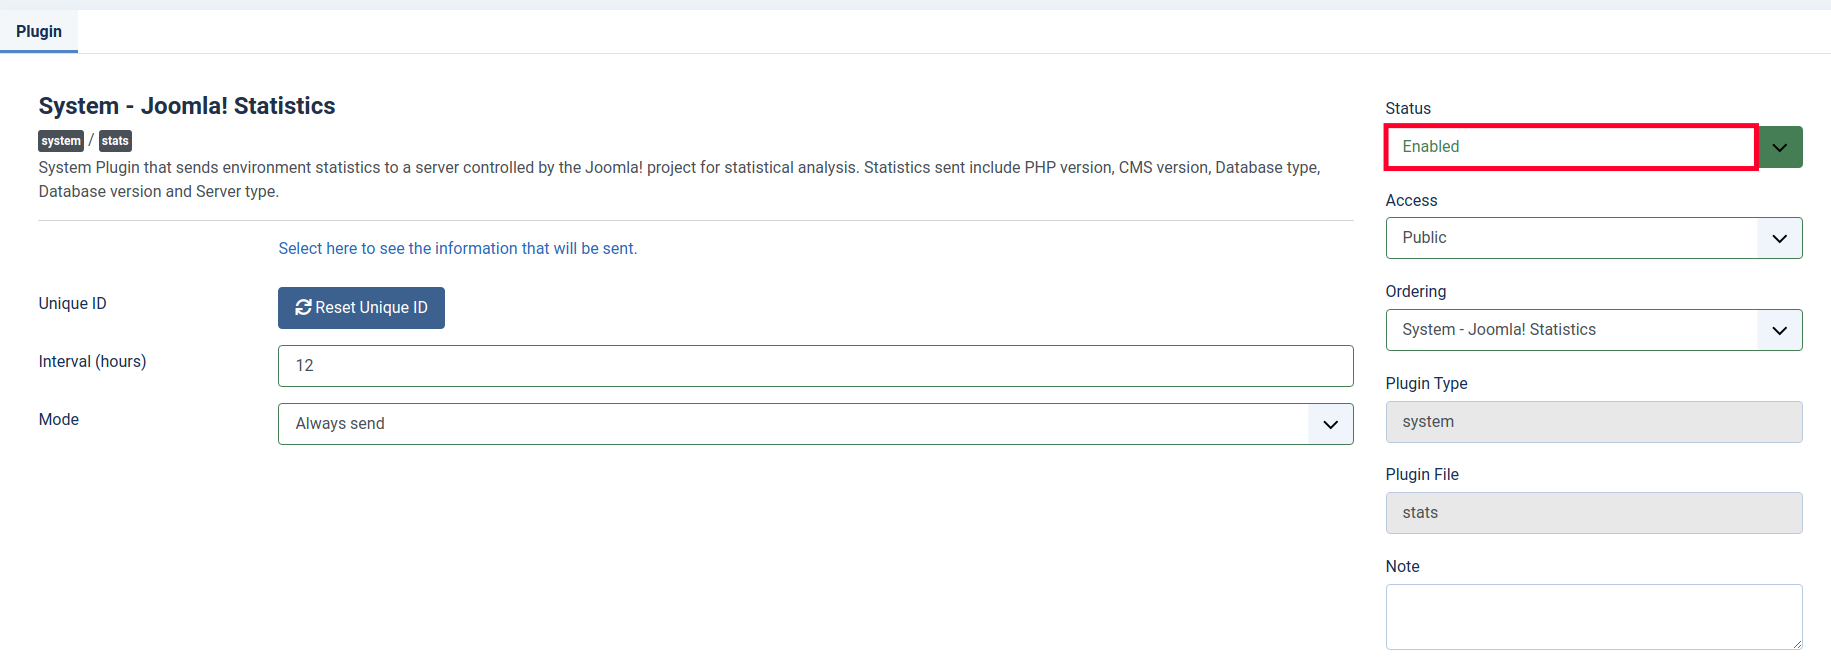 Enable or Disable Joomla 4 Statistics